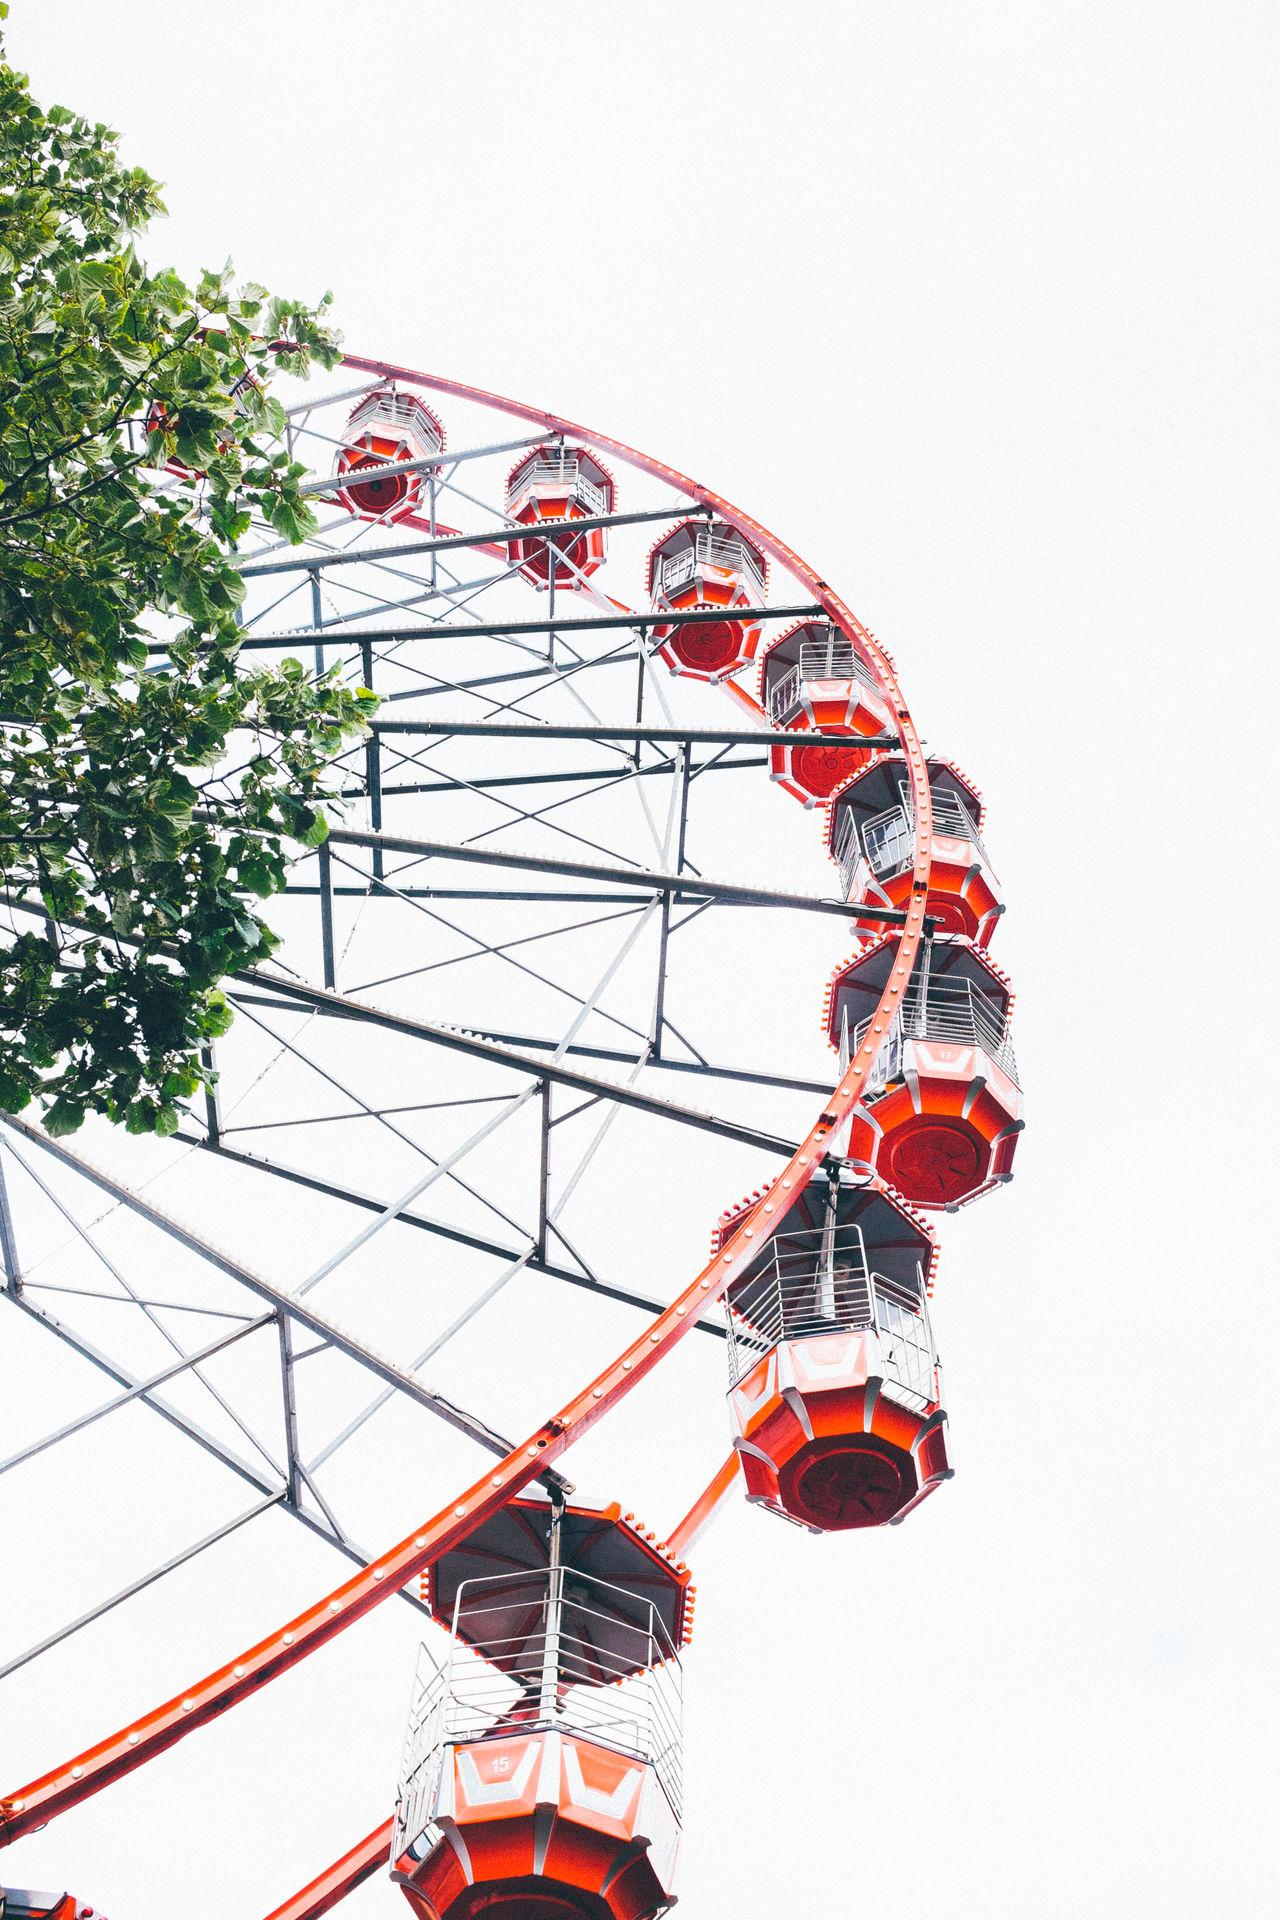 Festival wheel Amusementpark Festival FUJIFILM X100S FujiX100S Outdoors Trees VSCO Vscofilm Wheel X100S